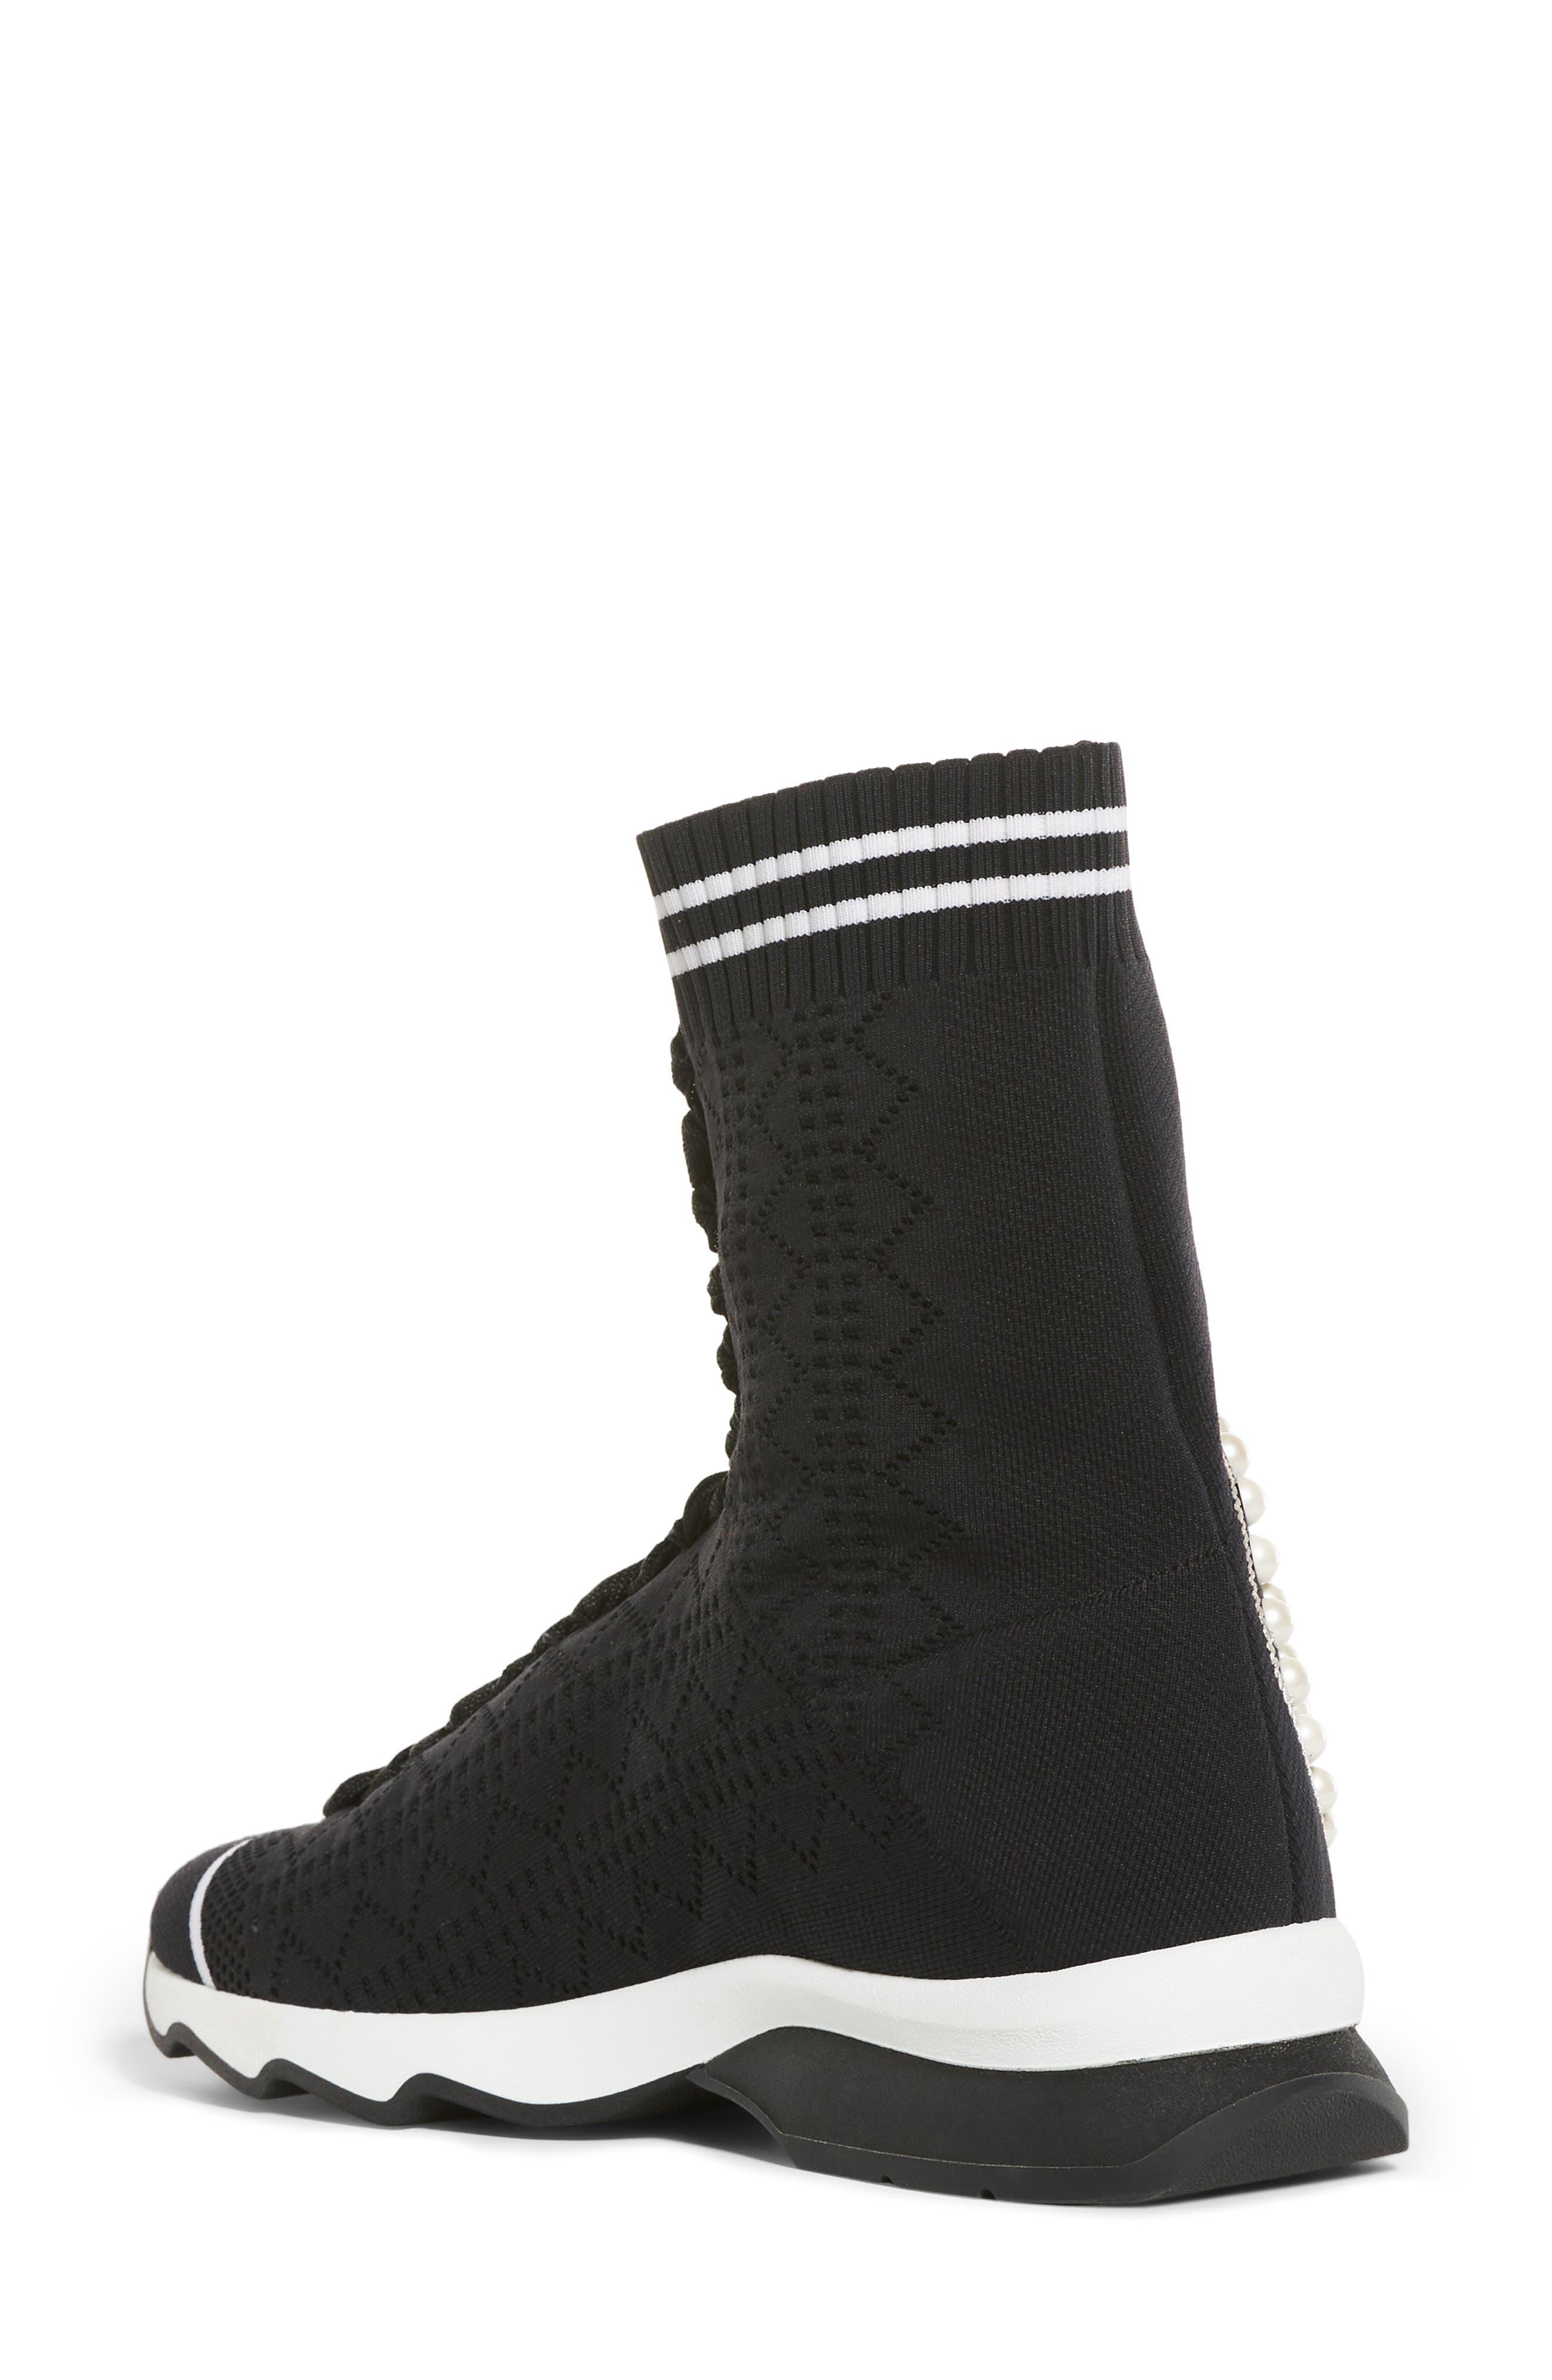 Rockoko Pearland Embellished Sock Sneaker,                             Alternate thumbnail 2, color,                             Black